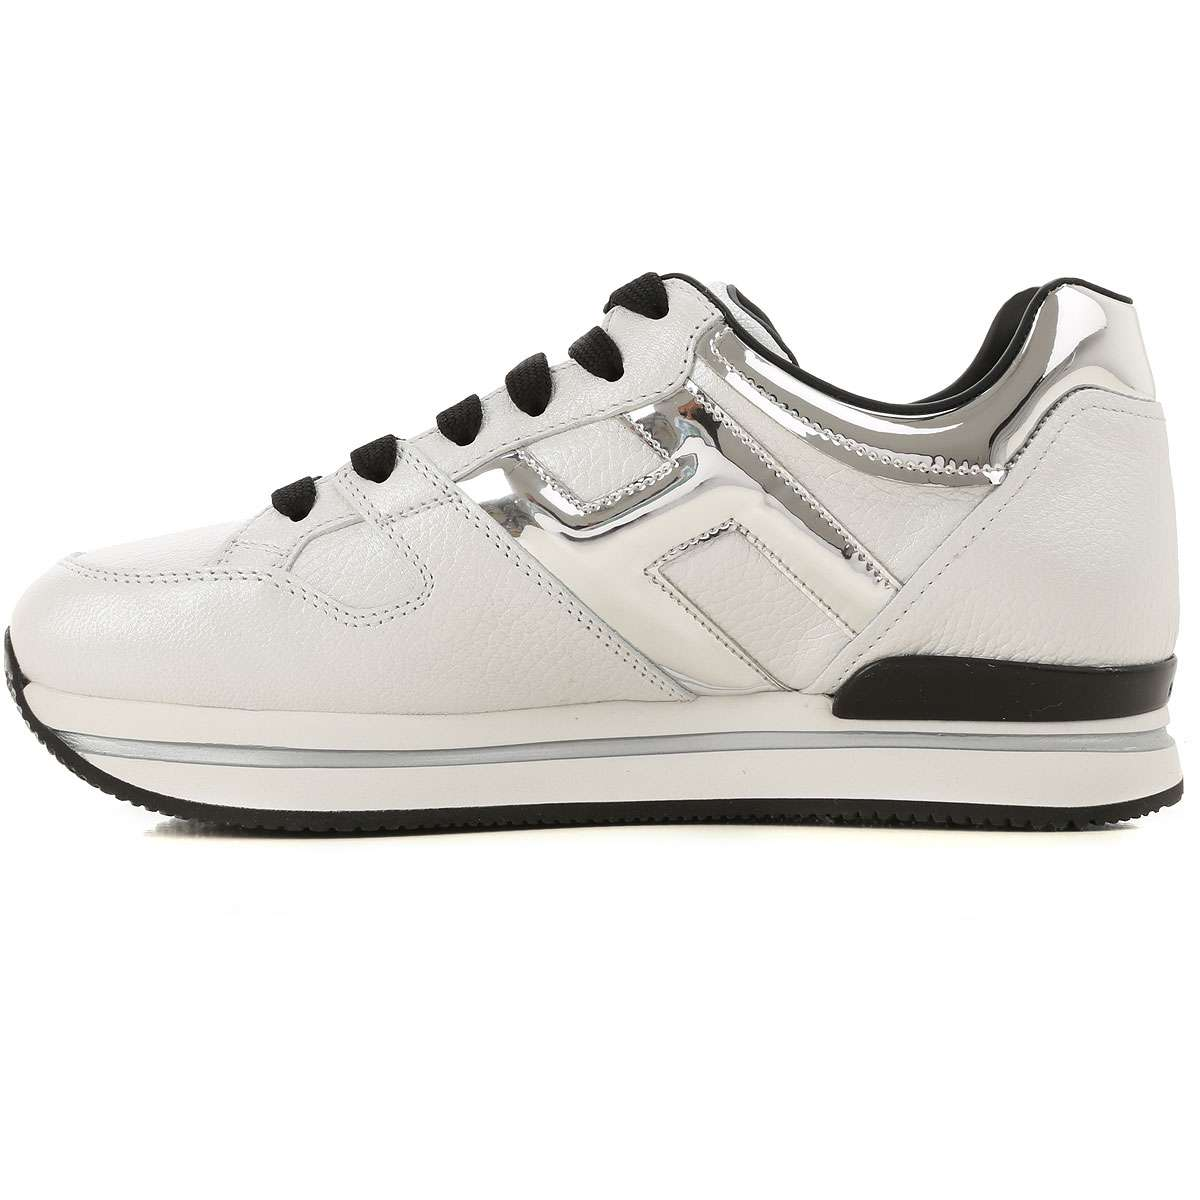 https://www.parmax.com/media/catalog/product/a/i/AI-outlet_parmax-scarpe-donna-Hogan-hxw2220t548ljz0351-C.jpg